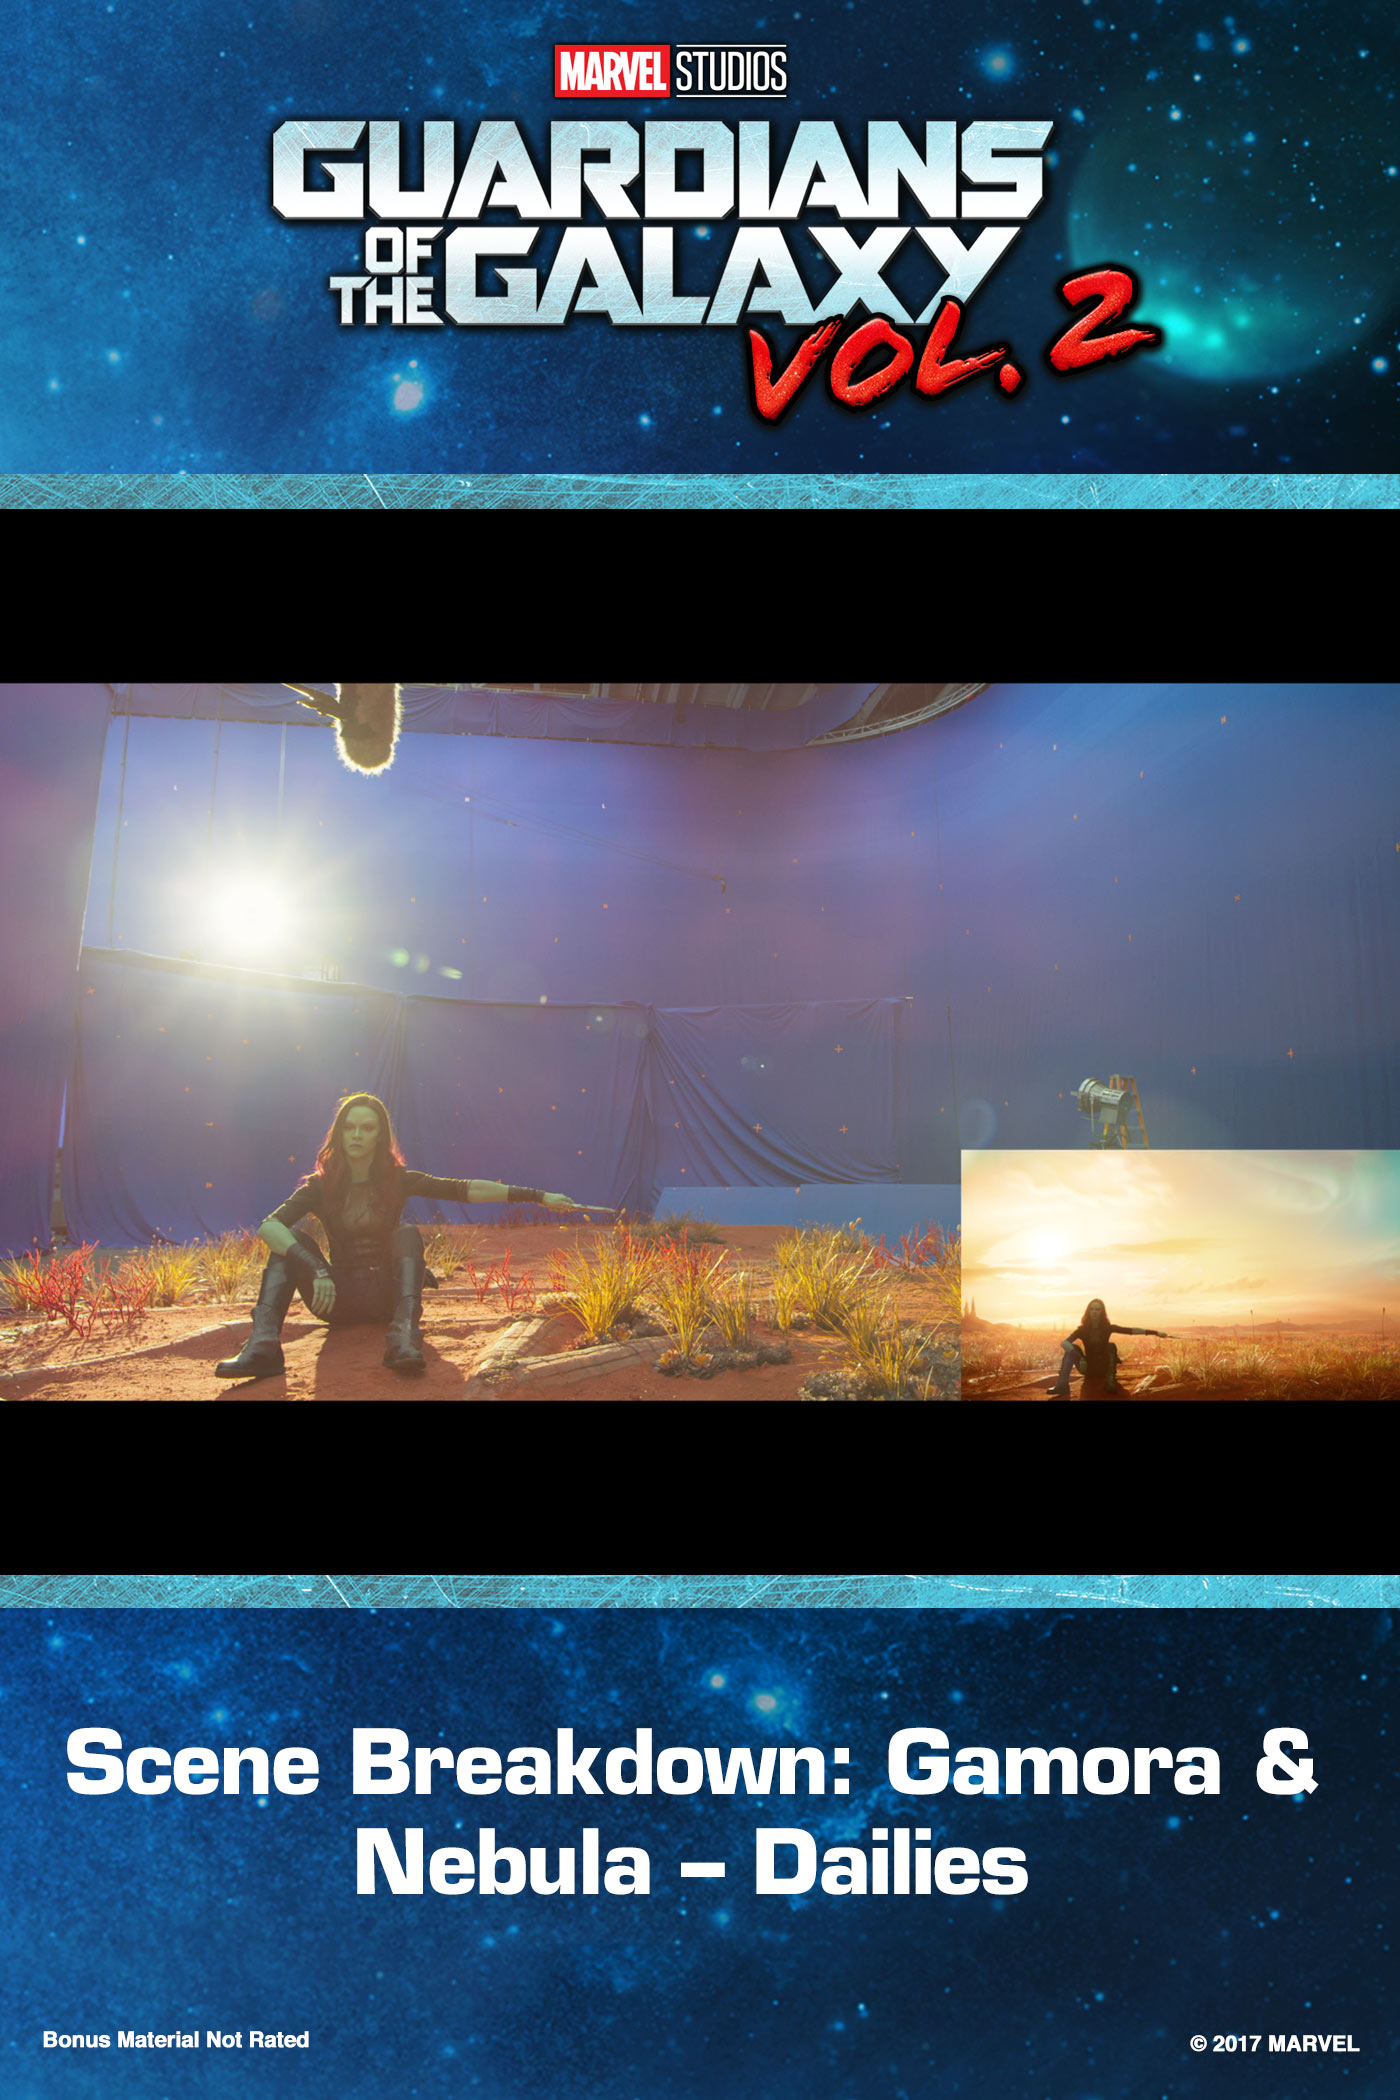 Scene Breakdown: Gamora & Nebula – Dailies